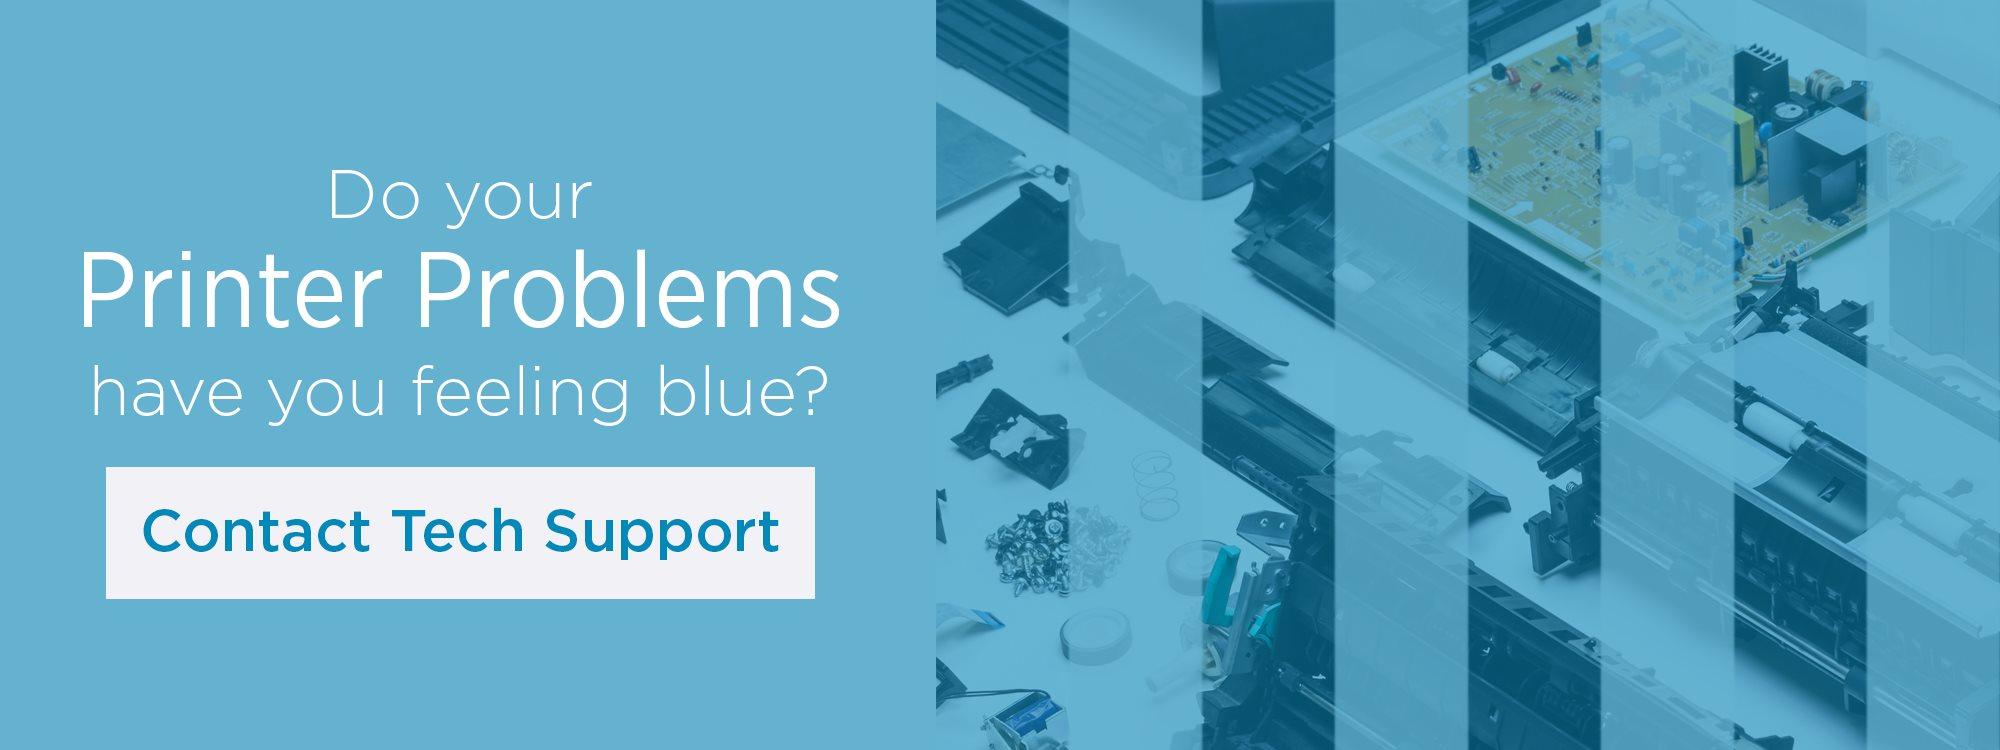 Printer Problem Contact Tech Support